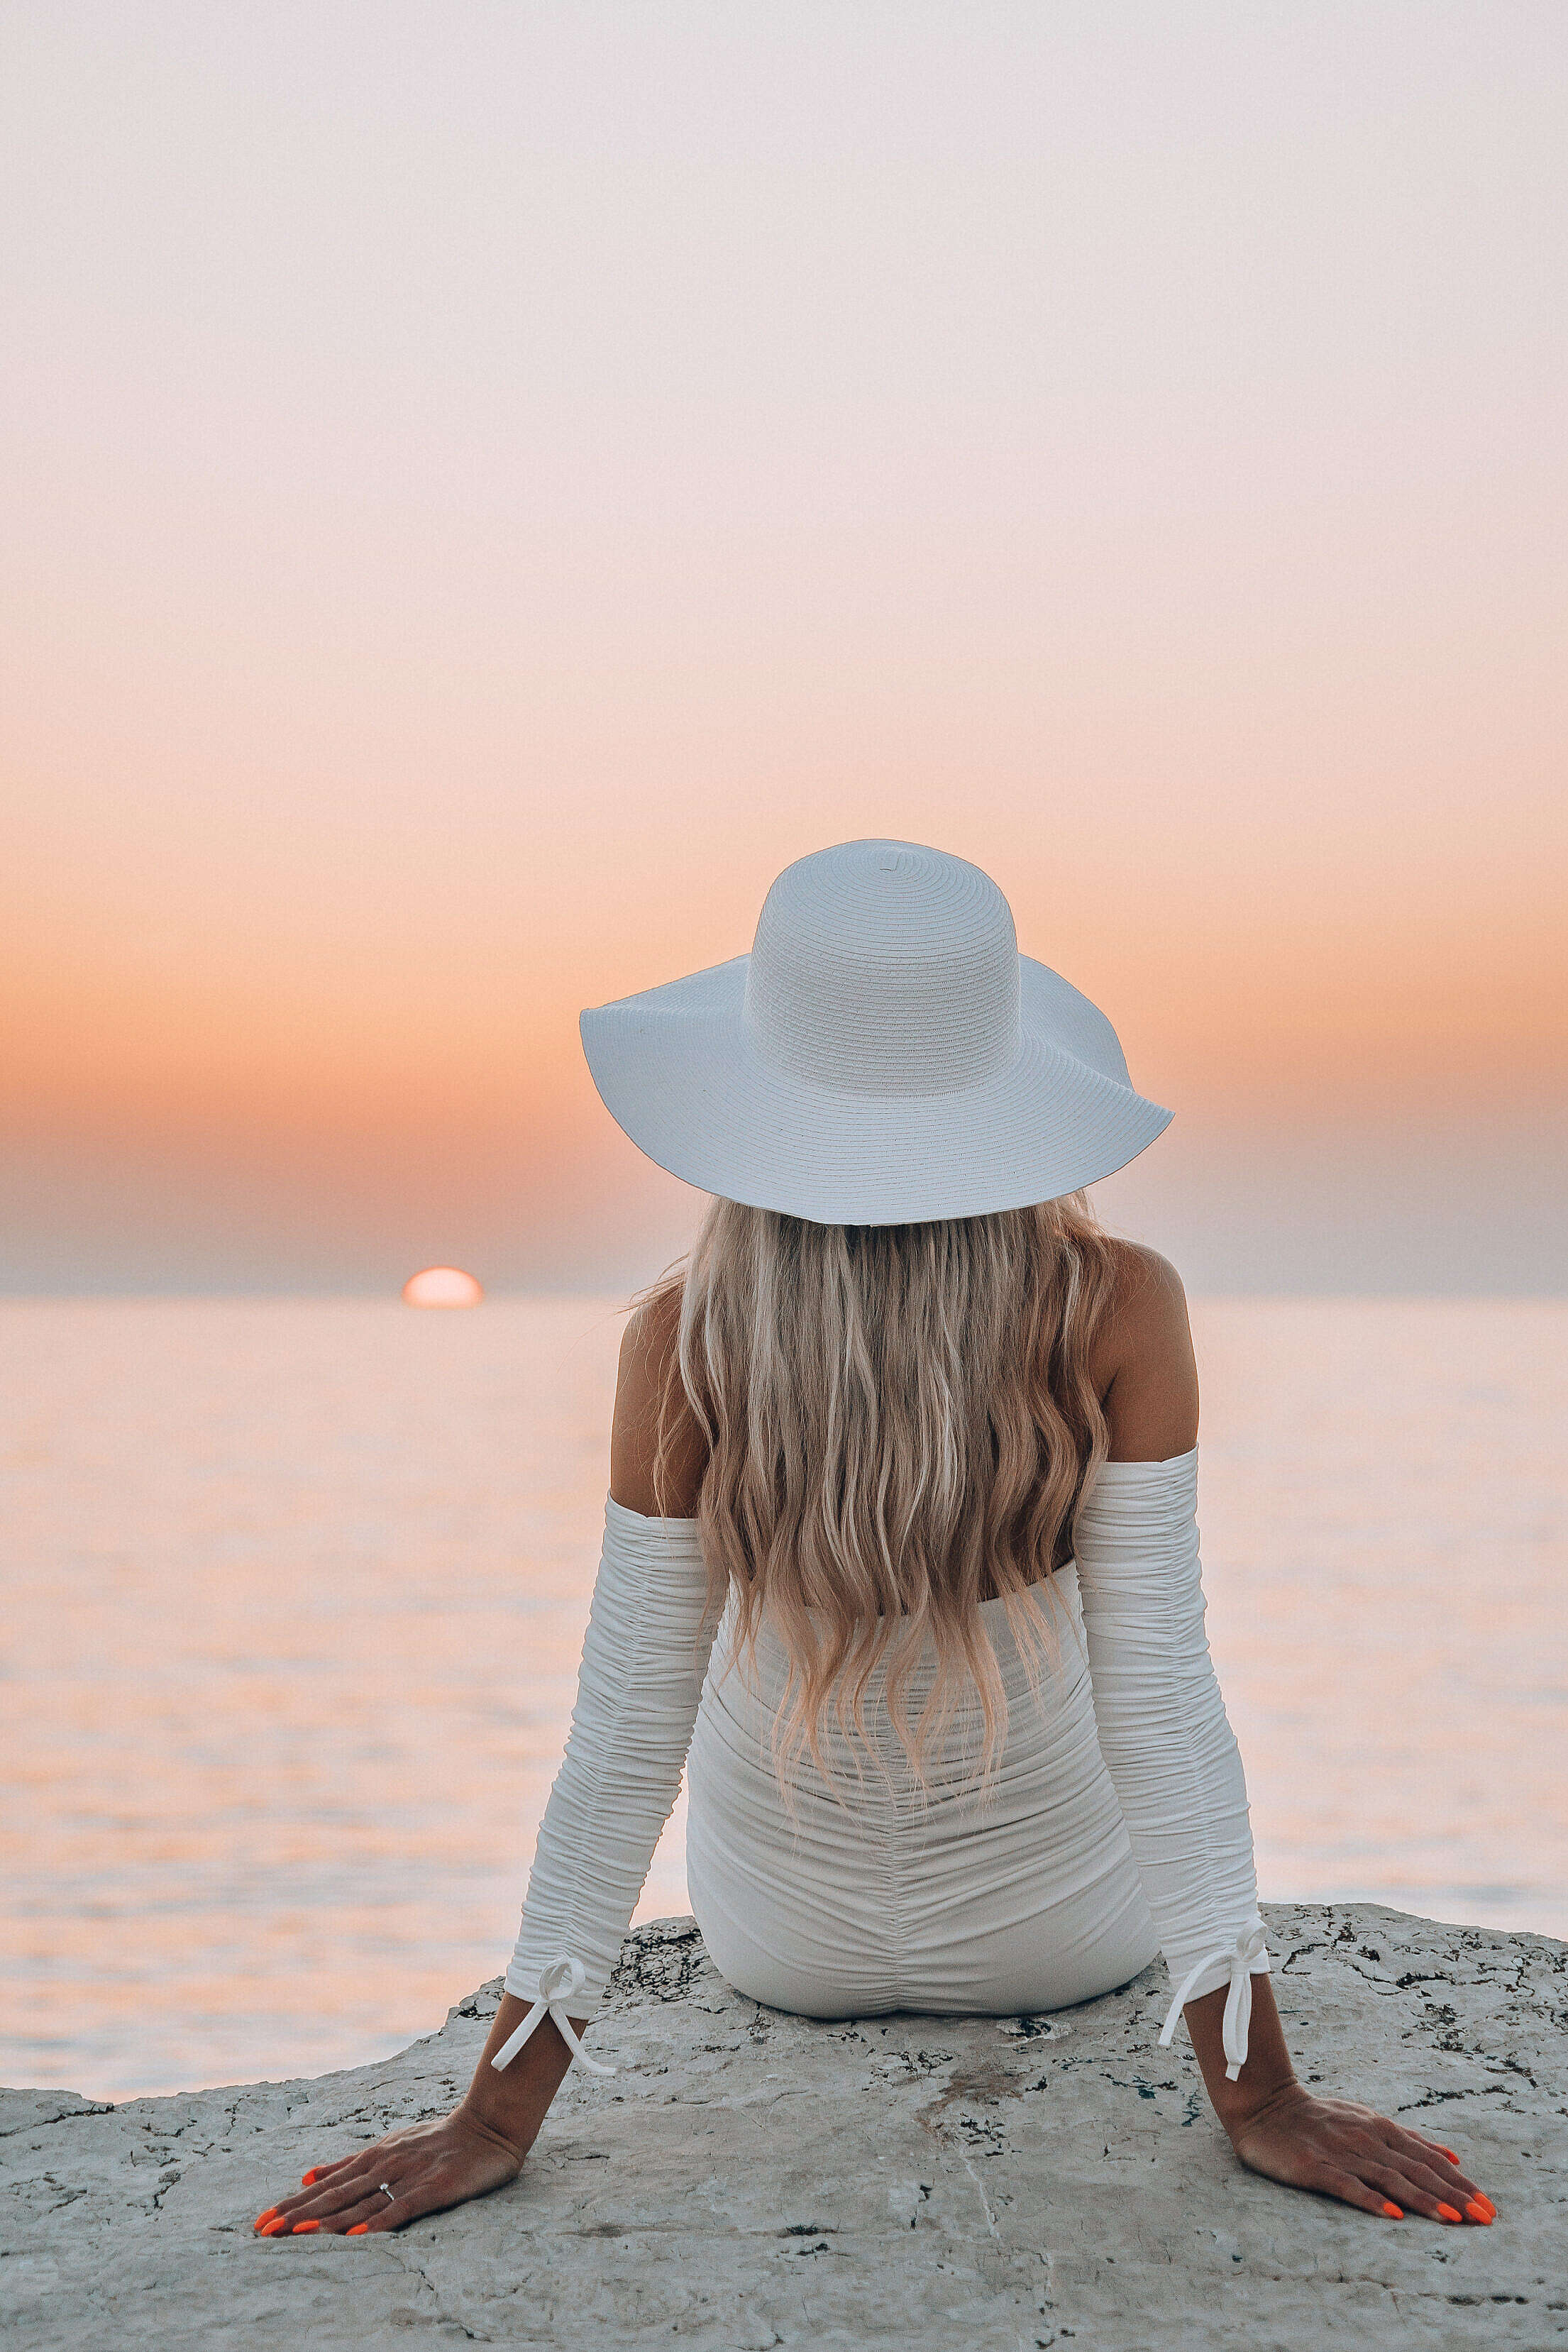 Beautiful Woman in White Hat Sitting on a Rock and Enjoying Sea Sunset Free Stock Photo